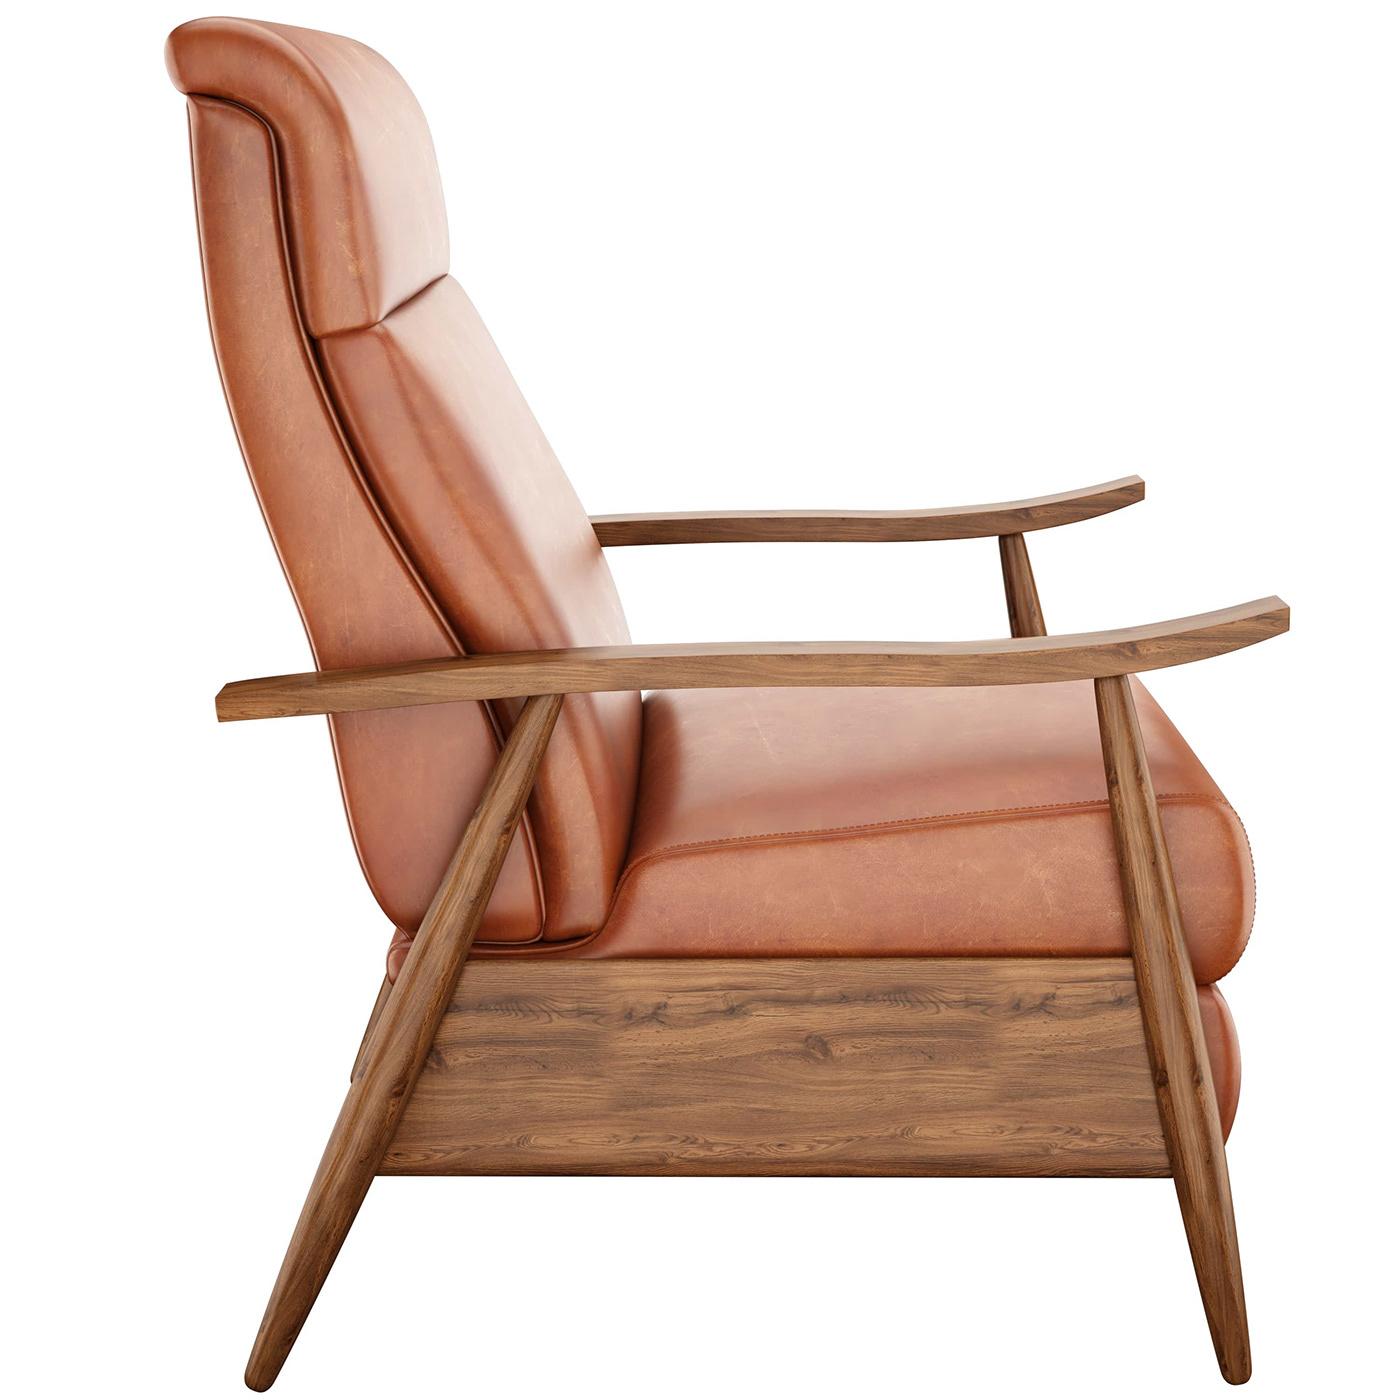 3dsmax,design,furniture,interiordesign,modelling,product,vraynext